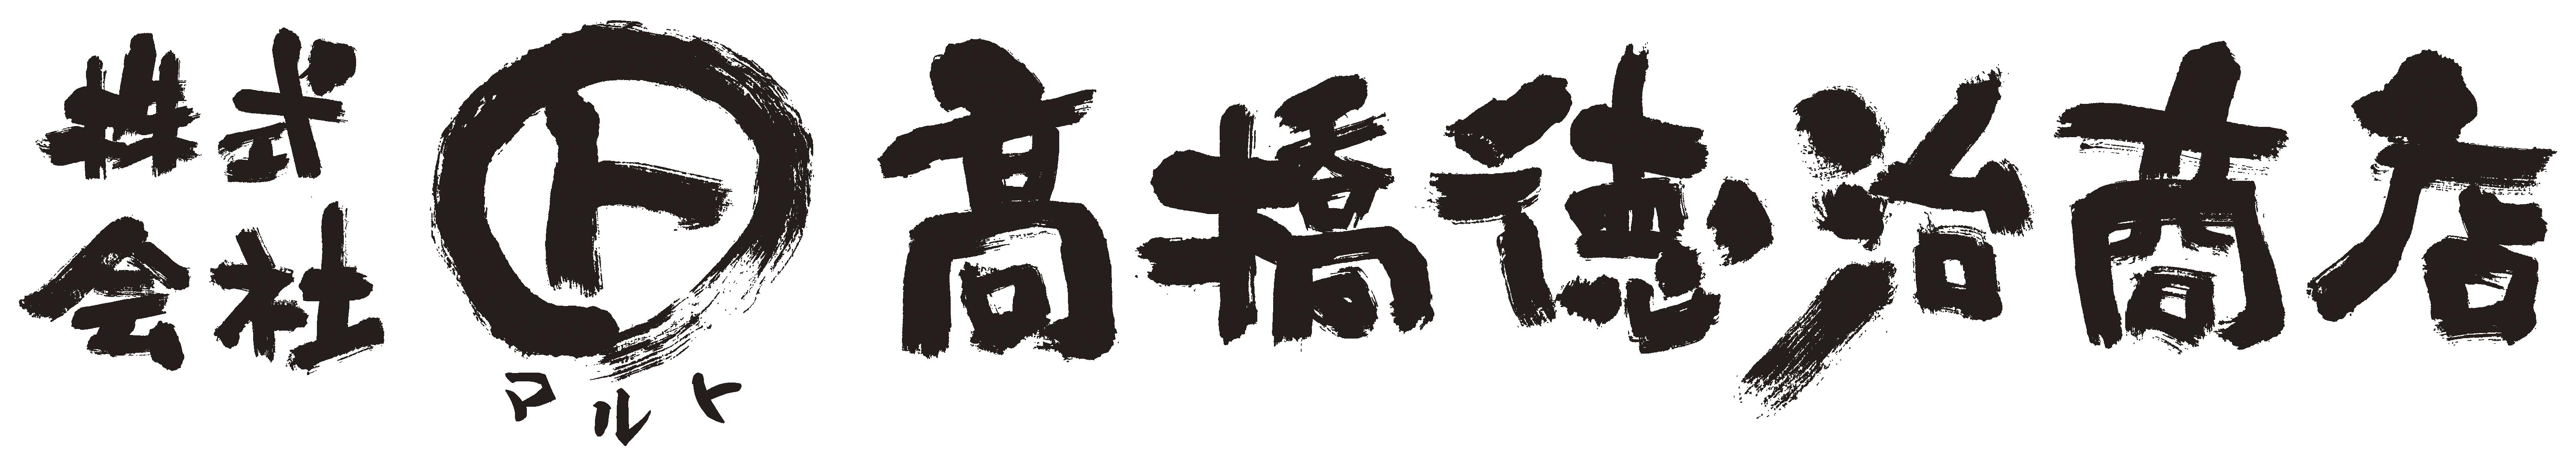 株式会社マルト高橋徳治商店